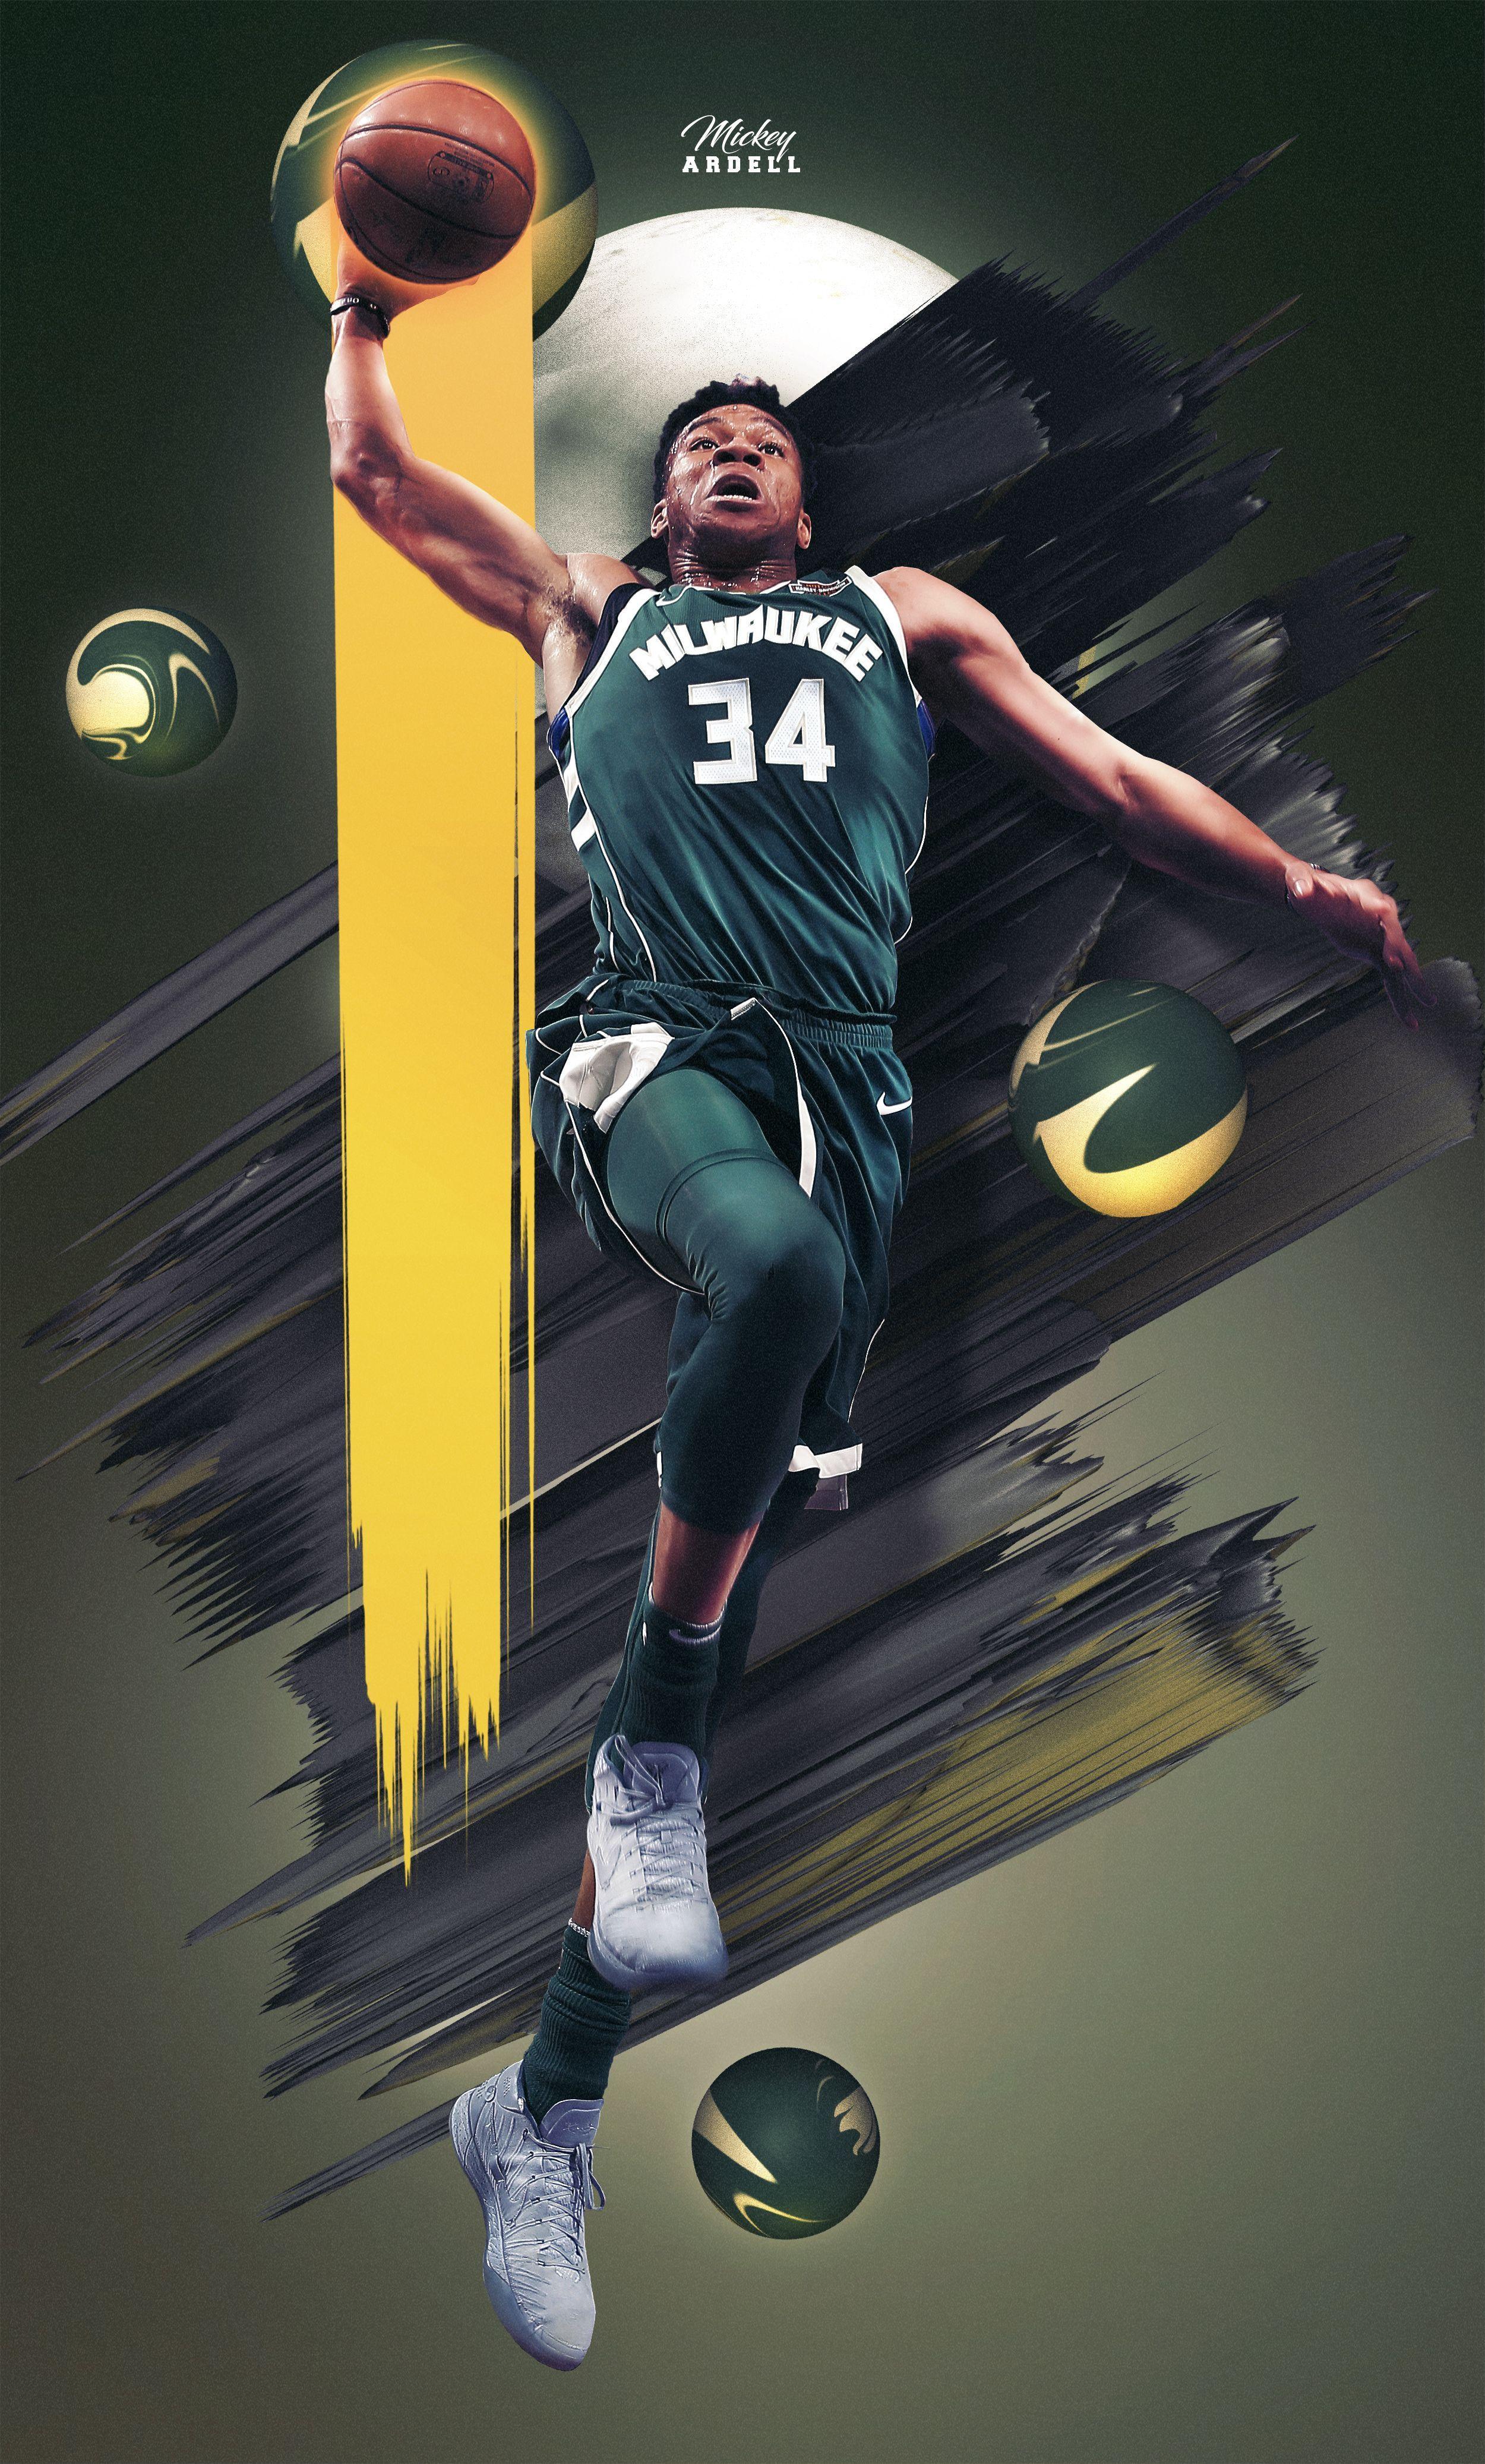 NBA Supreme Wallpapers - Wallpaper Cave